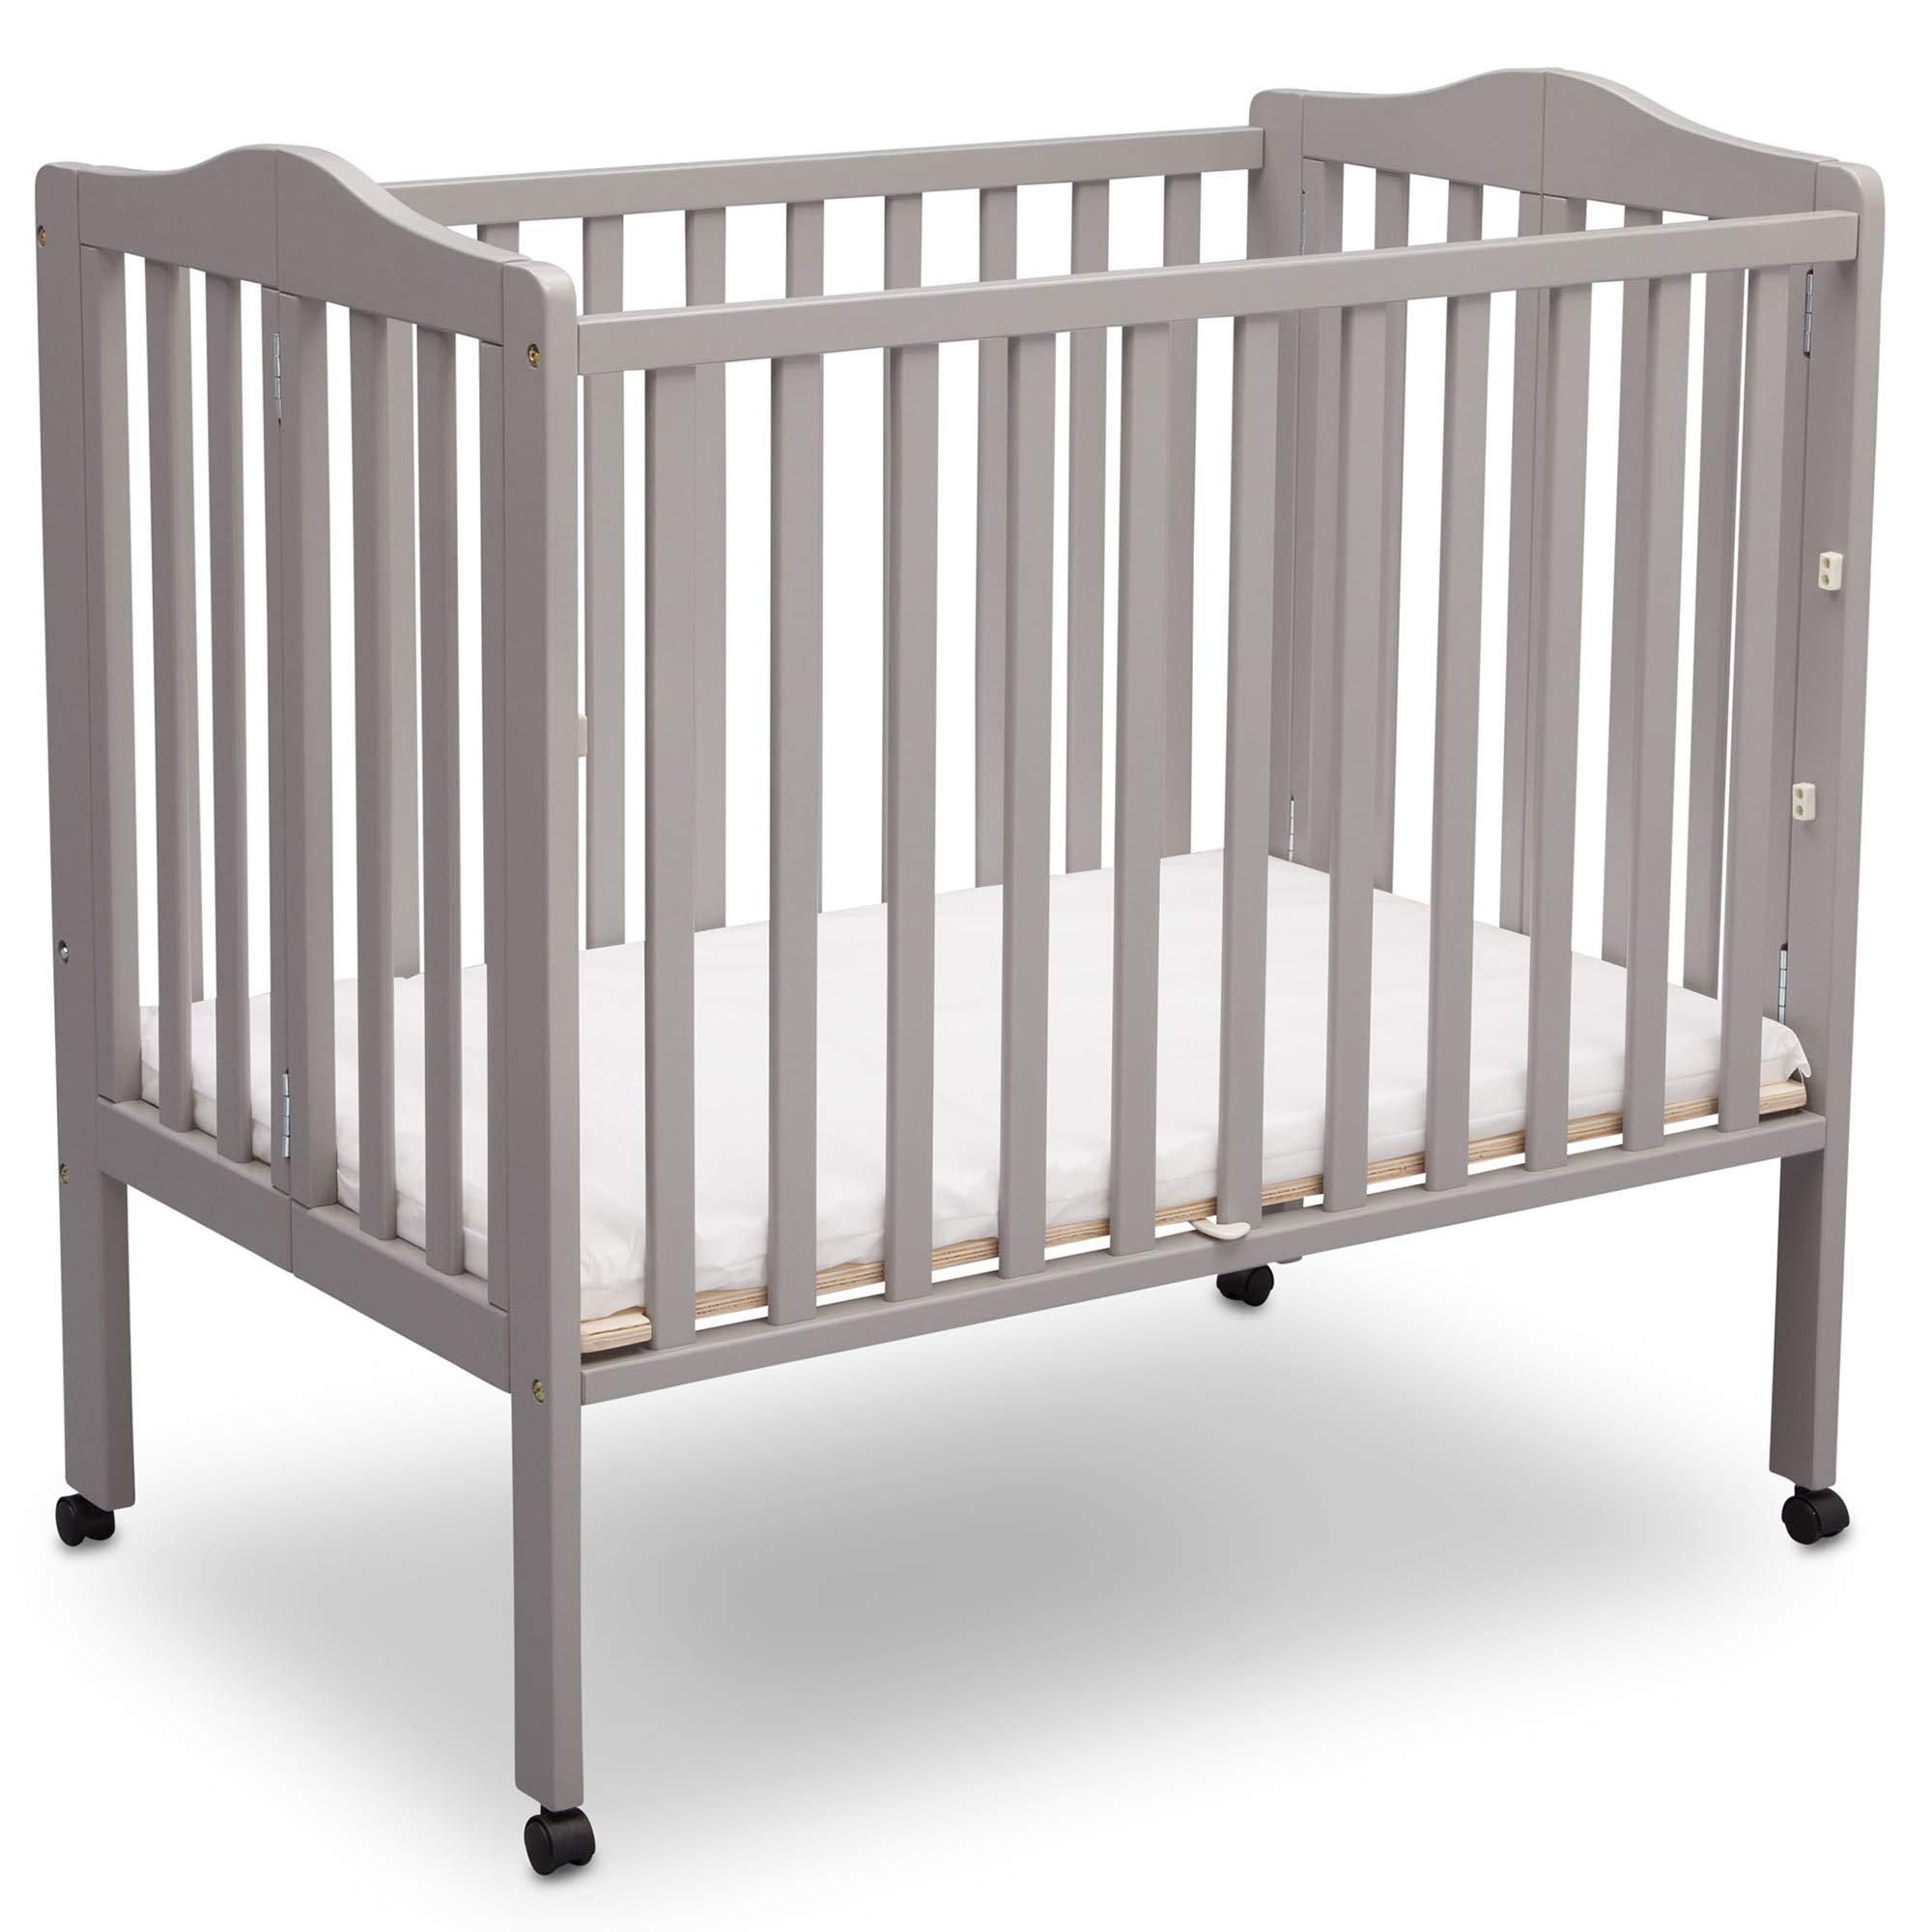 Delta Children Delta Children Folding Portable Mini Baby Crib with Mattress, Light Grey, Light Grey